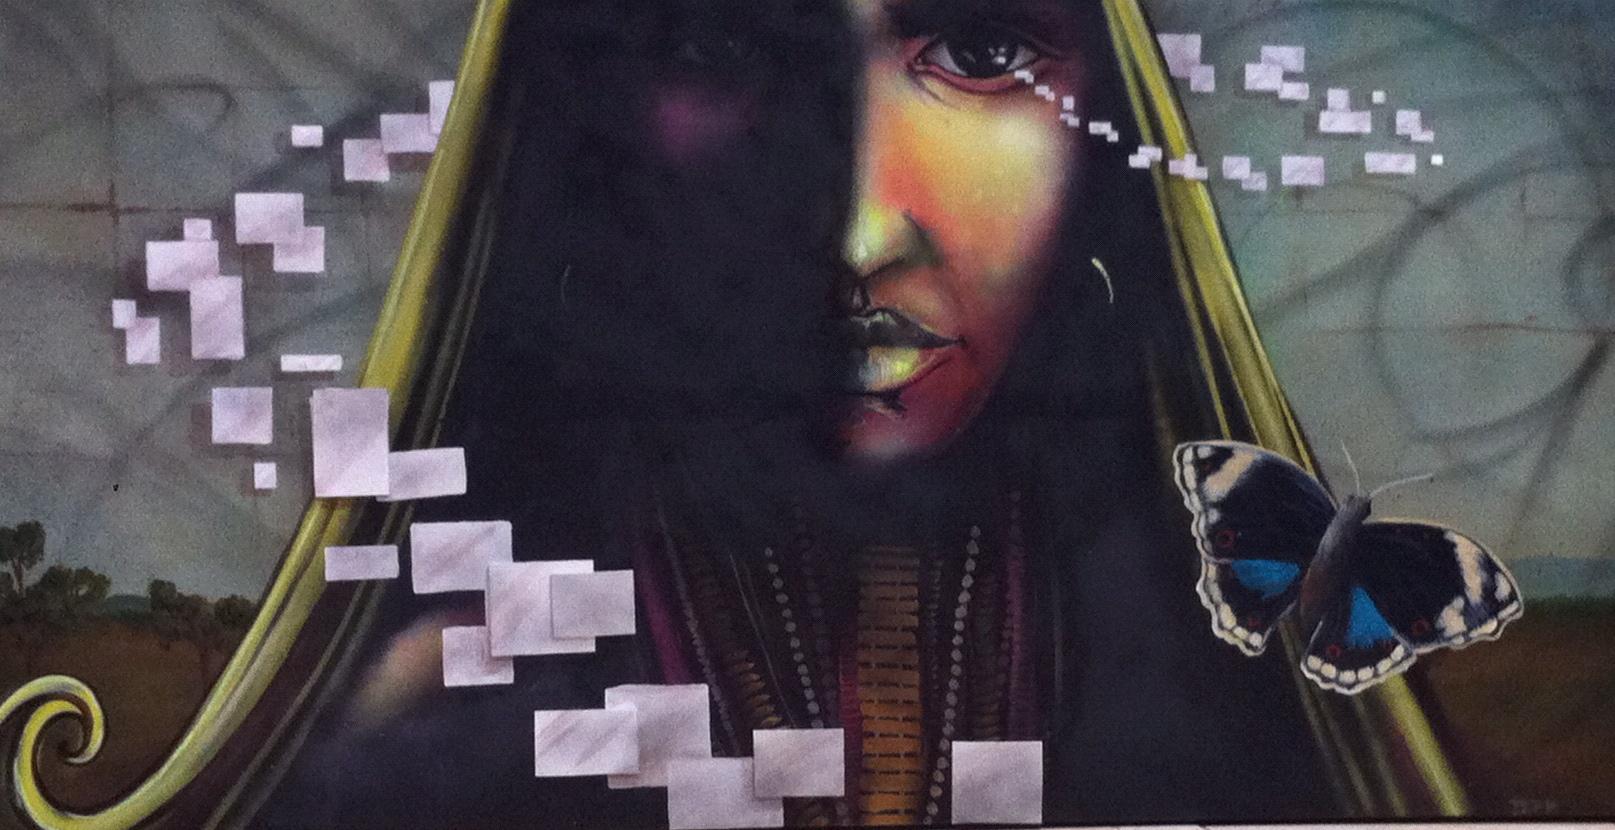 'The minds eye' Acrylic and Aerosol on canvas 36'x72''